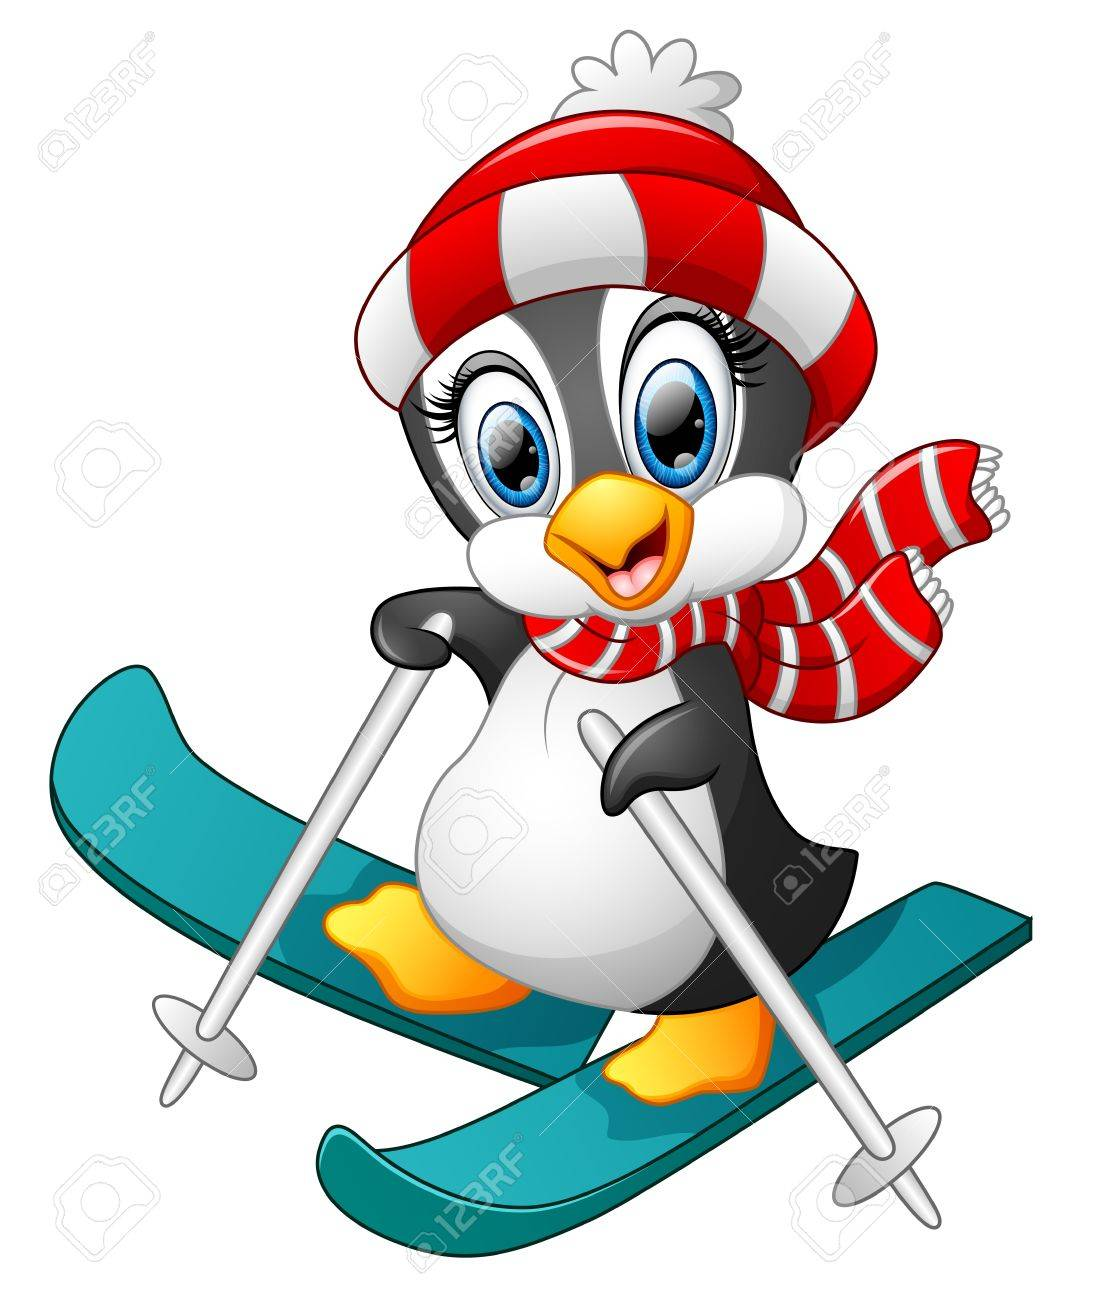 penguin cartoon skiing royalty free cliparts, vectors, and stock